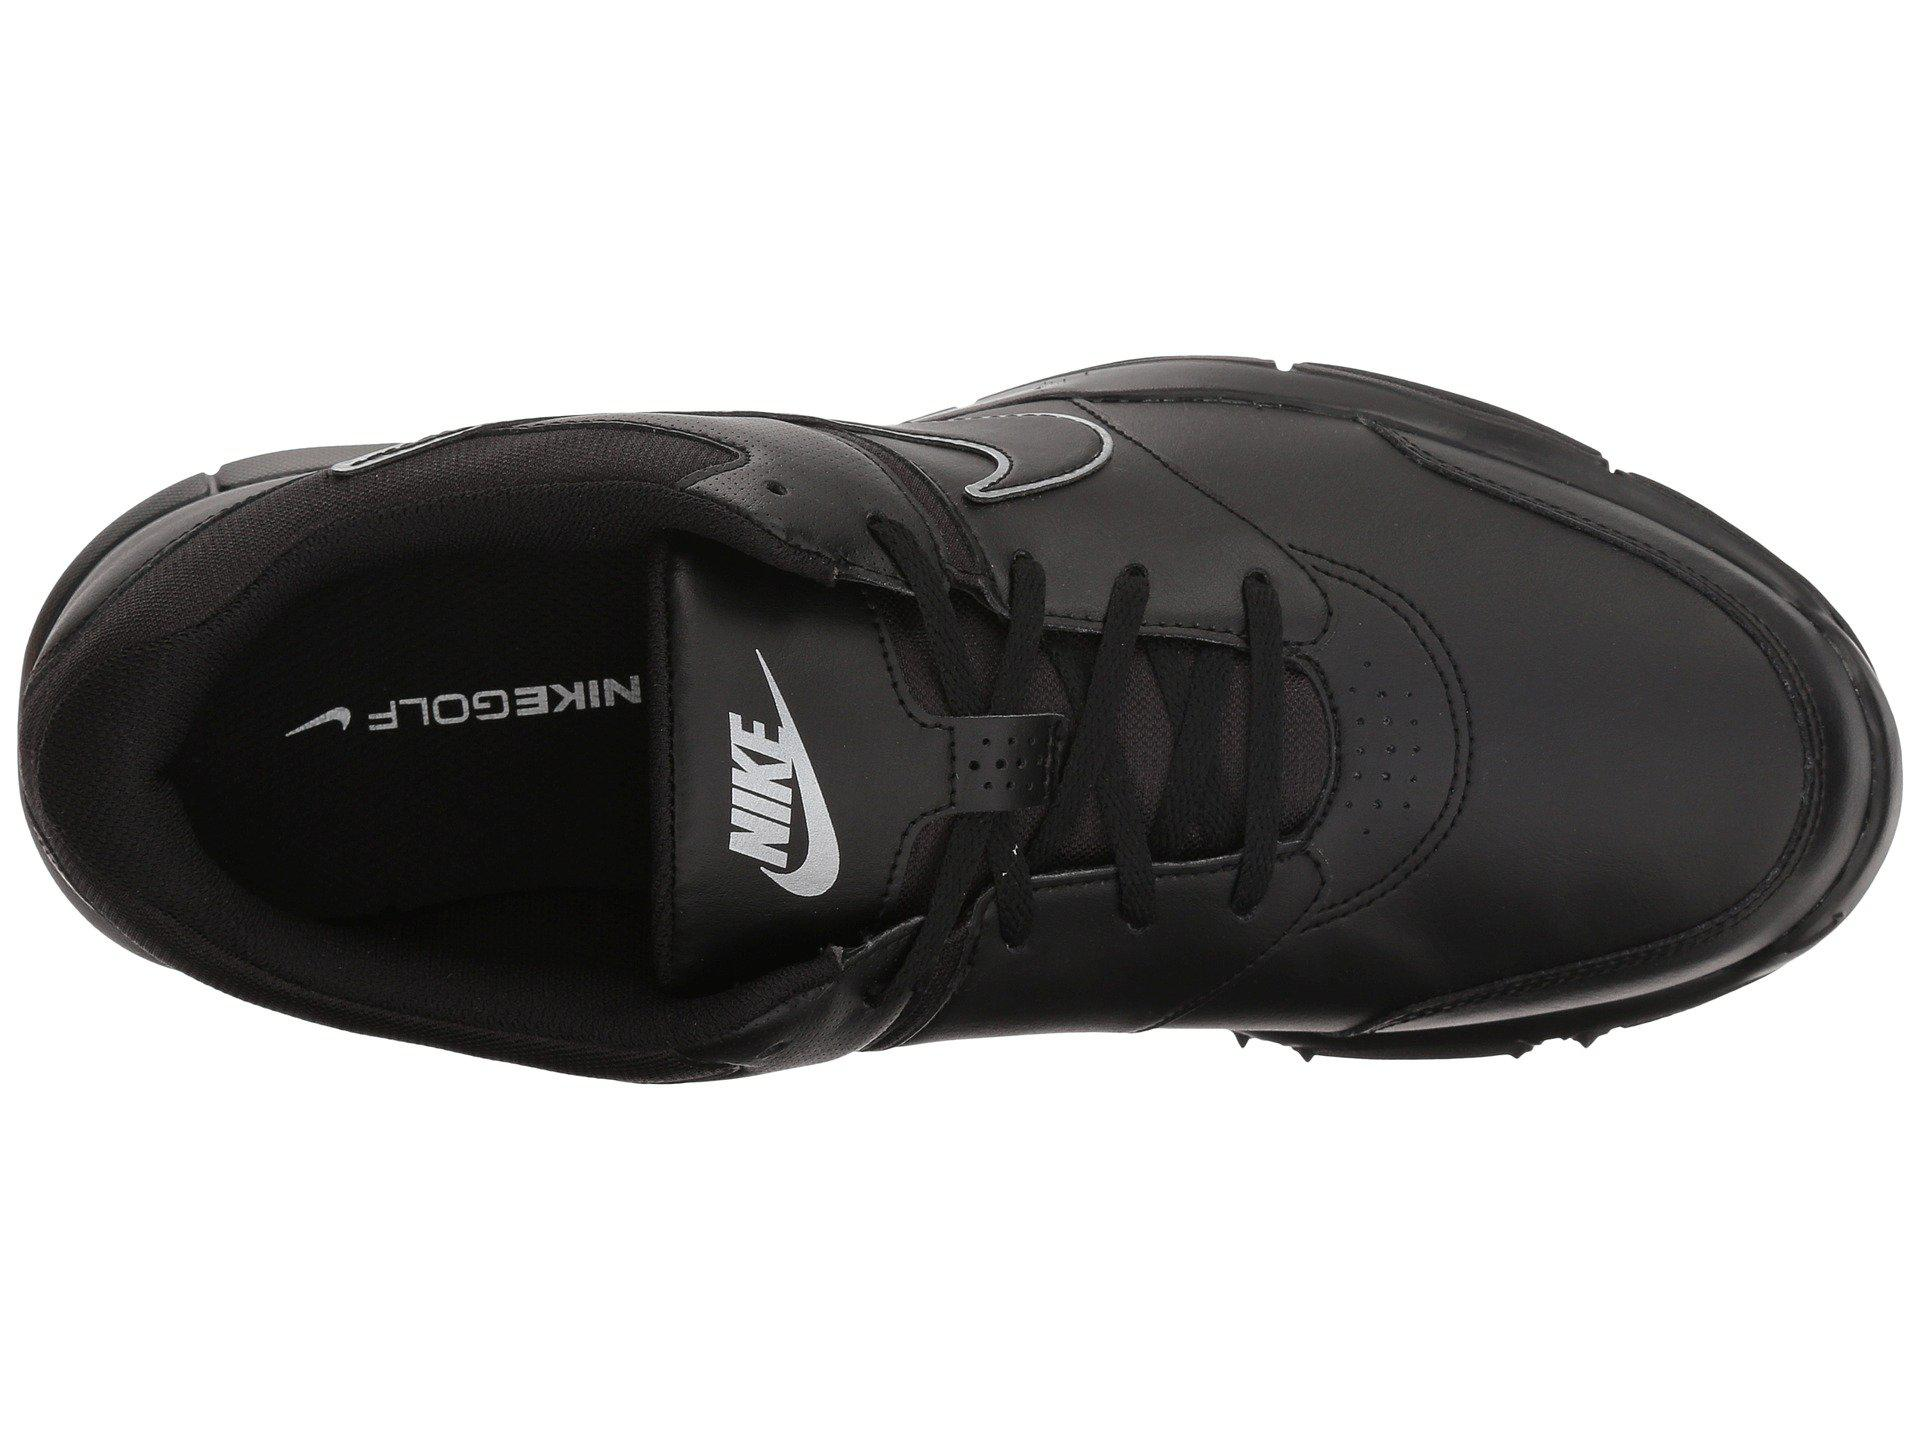 Nike - Durasport 4 (white metallic Silver black) Men s Golf Shoes for. View  fullscreen 88adbe193